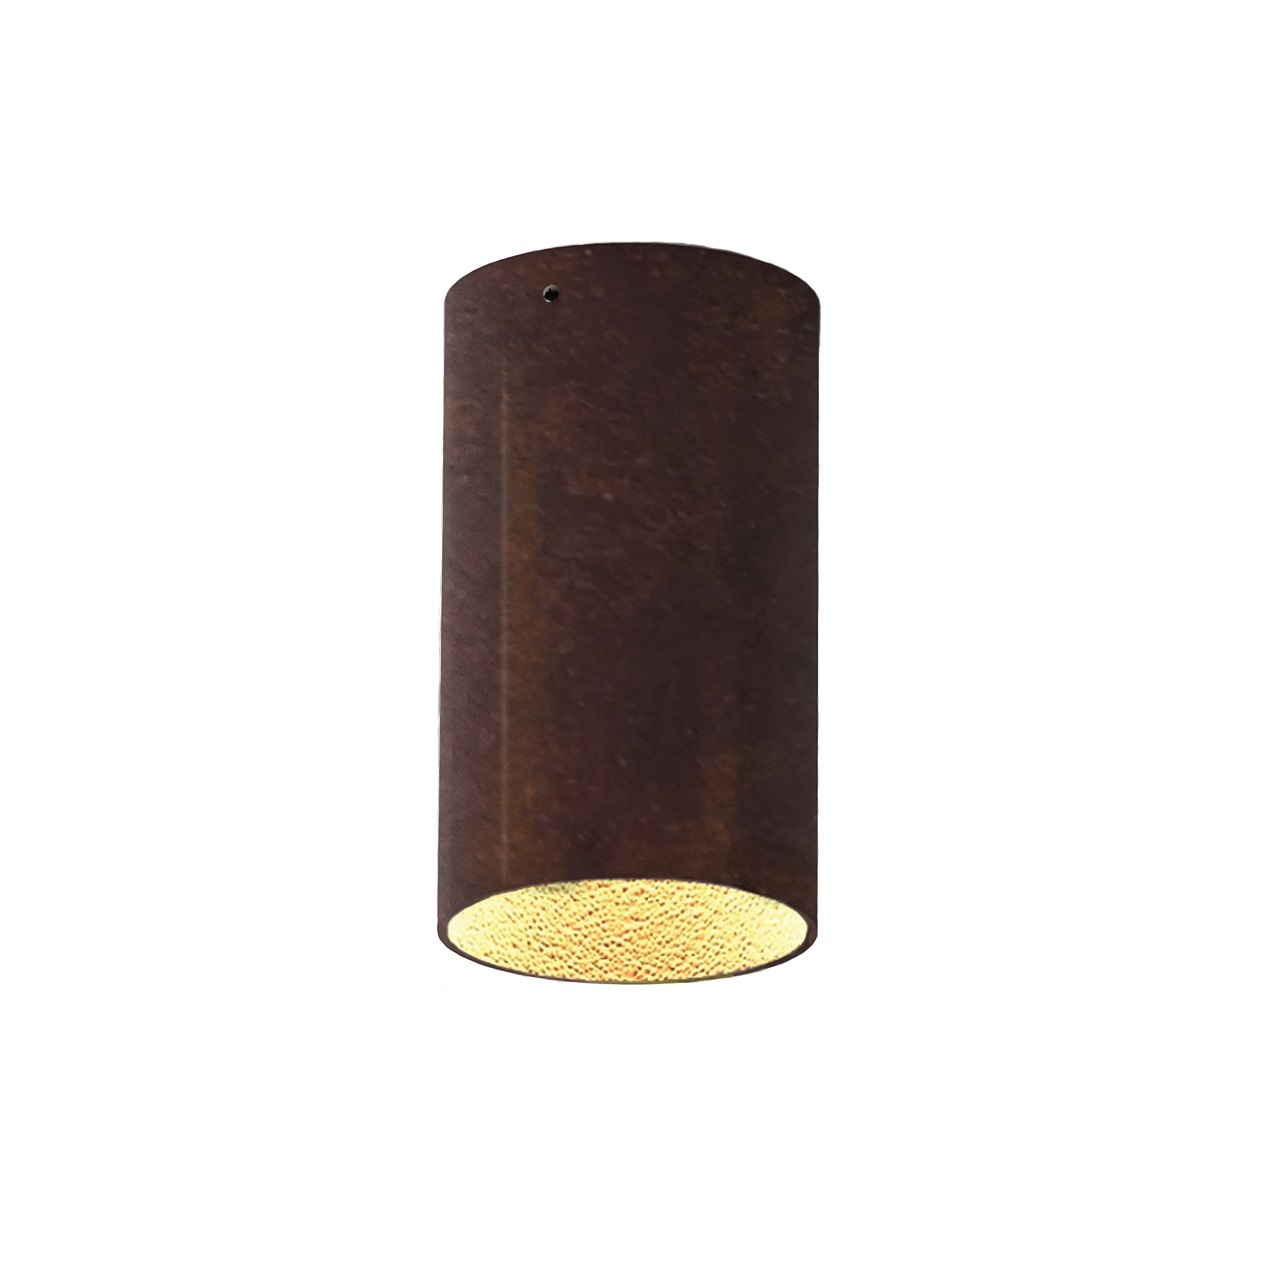 Karven RO-07 Roest ceiling 20 plafondlamp